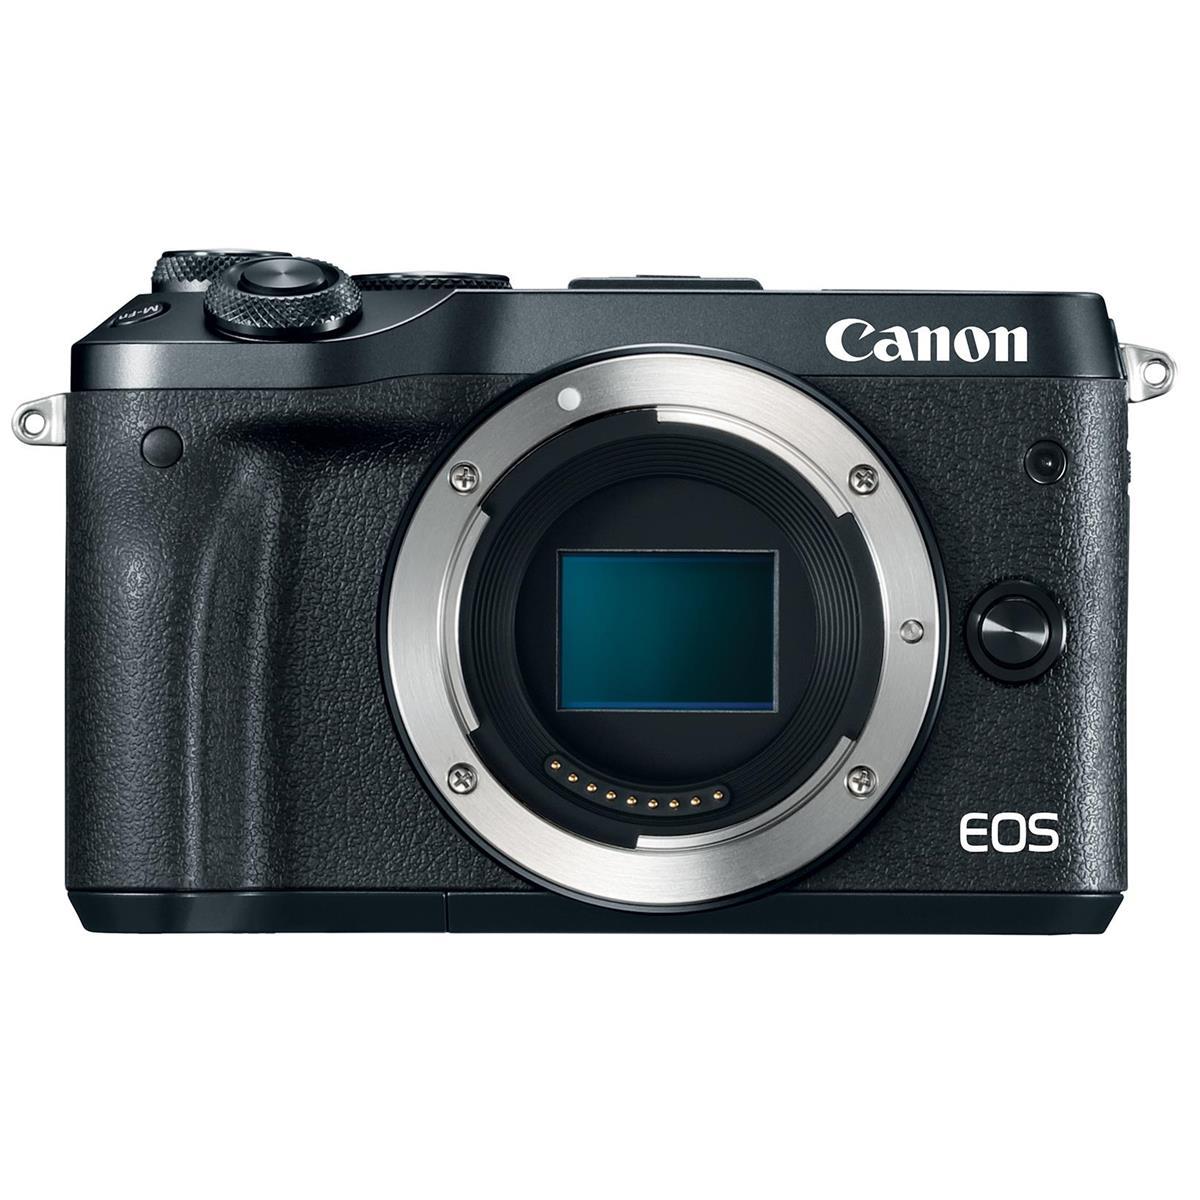 Canon M6 Camera: Body $300, w/ EF-M 15-45mm Lens $400, or w/ EF-M 18-150mm Lens $500 + Free s/h